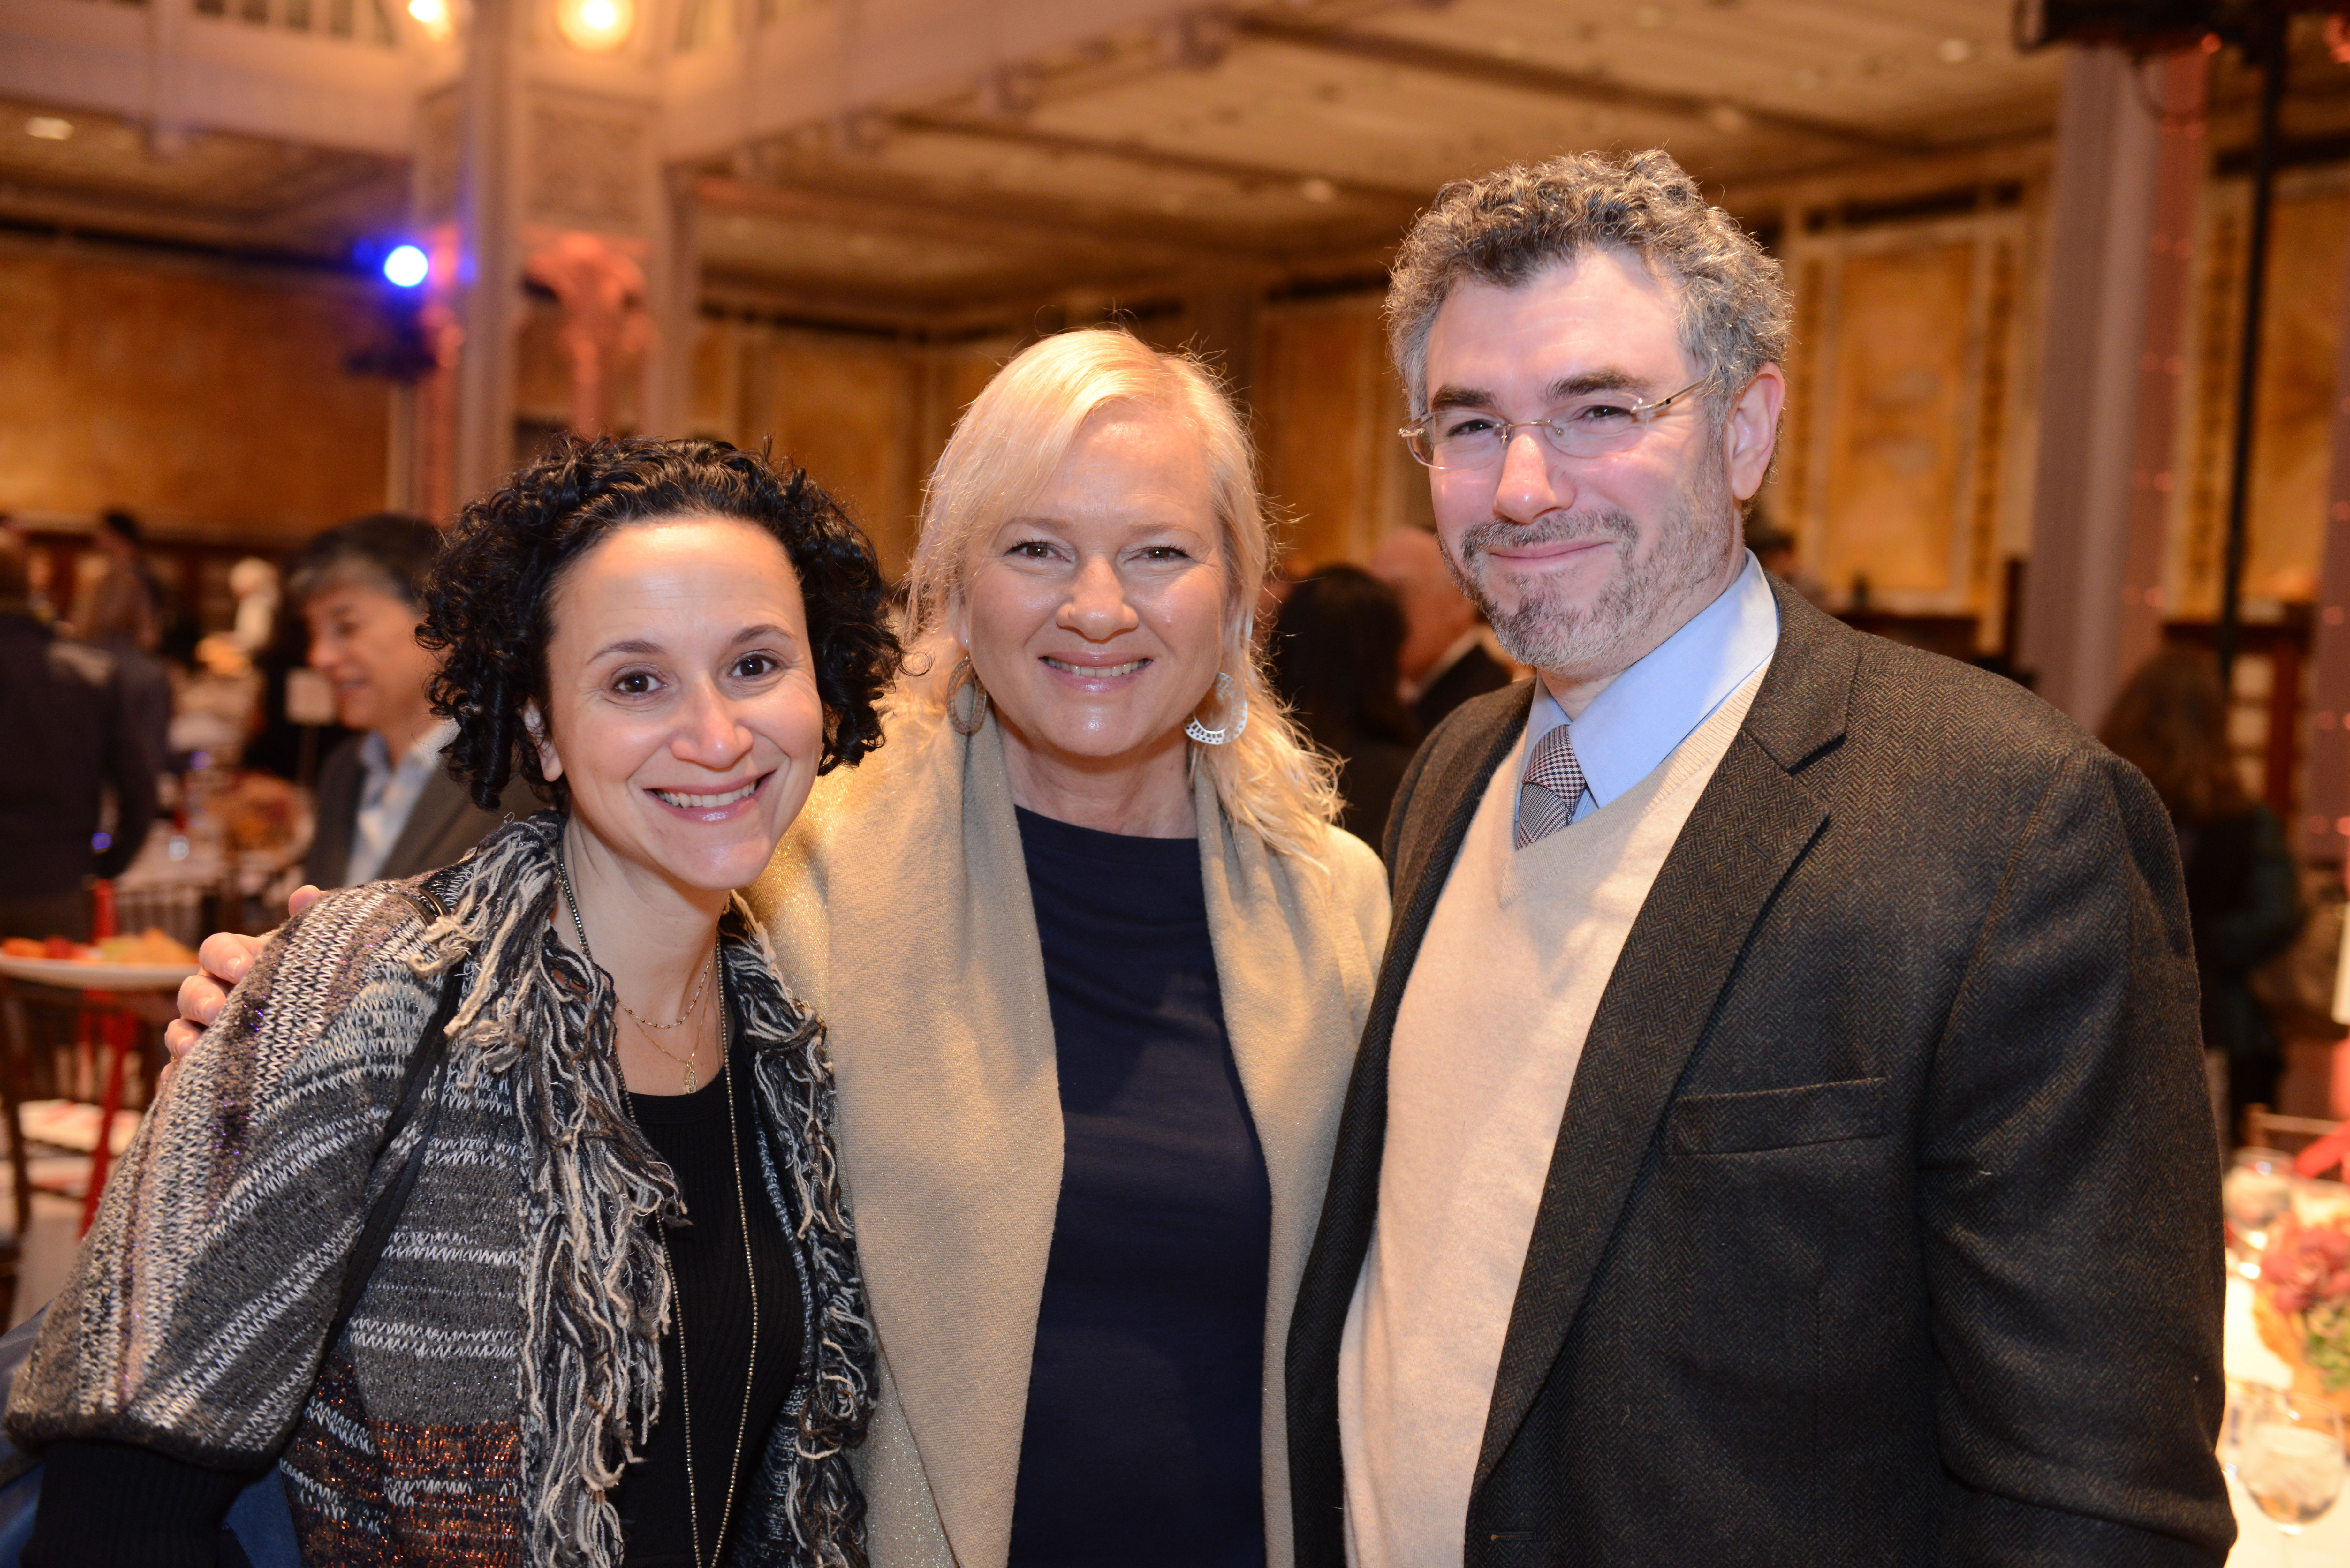 From left: Dr. Miriam Heller Stern, 2012 Covenant Award Recipient Karina Zilberman, and Rabbi Dr. Ariel Burger.